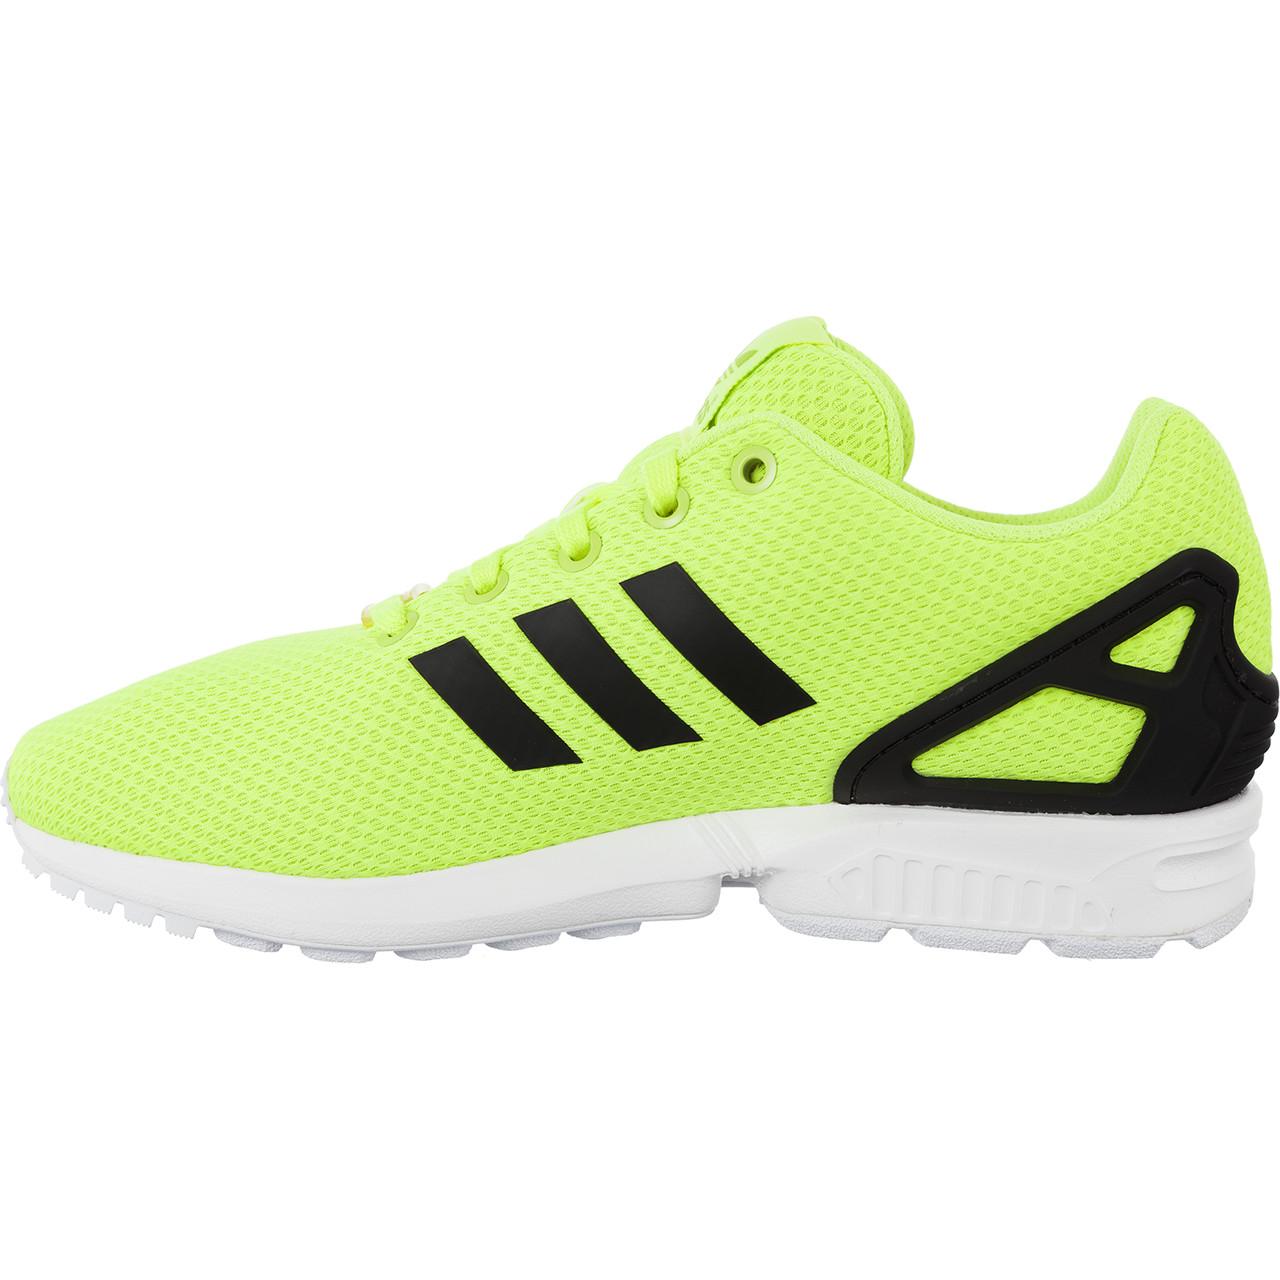 neonowe buty adidas